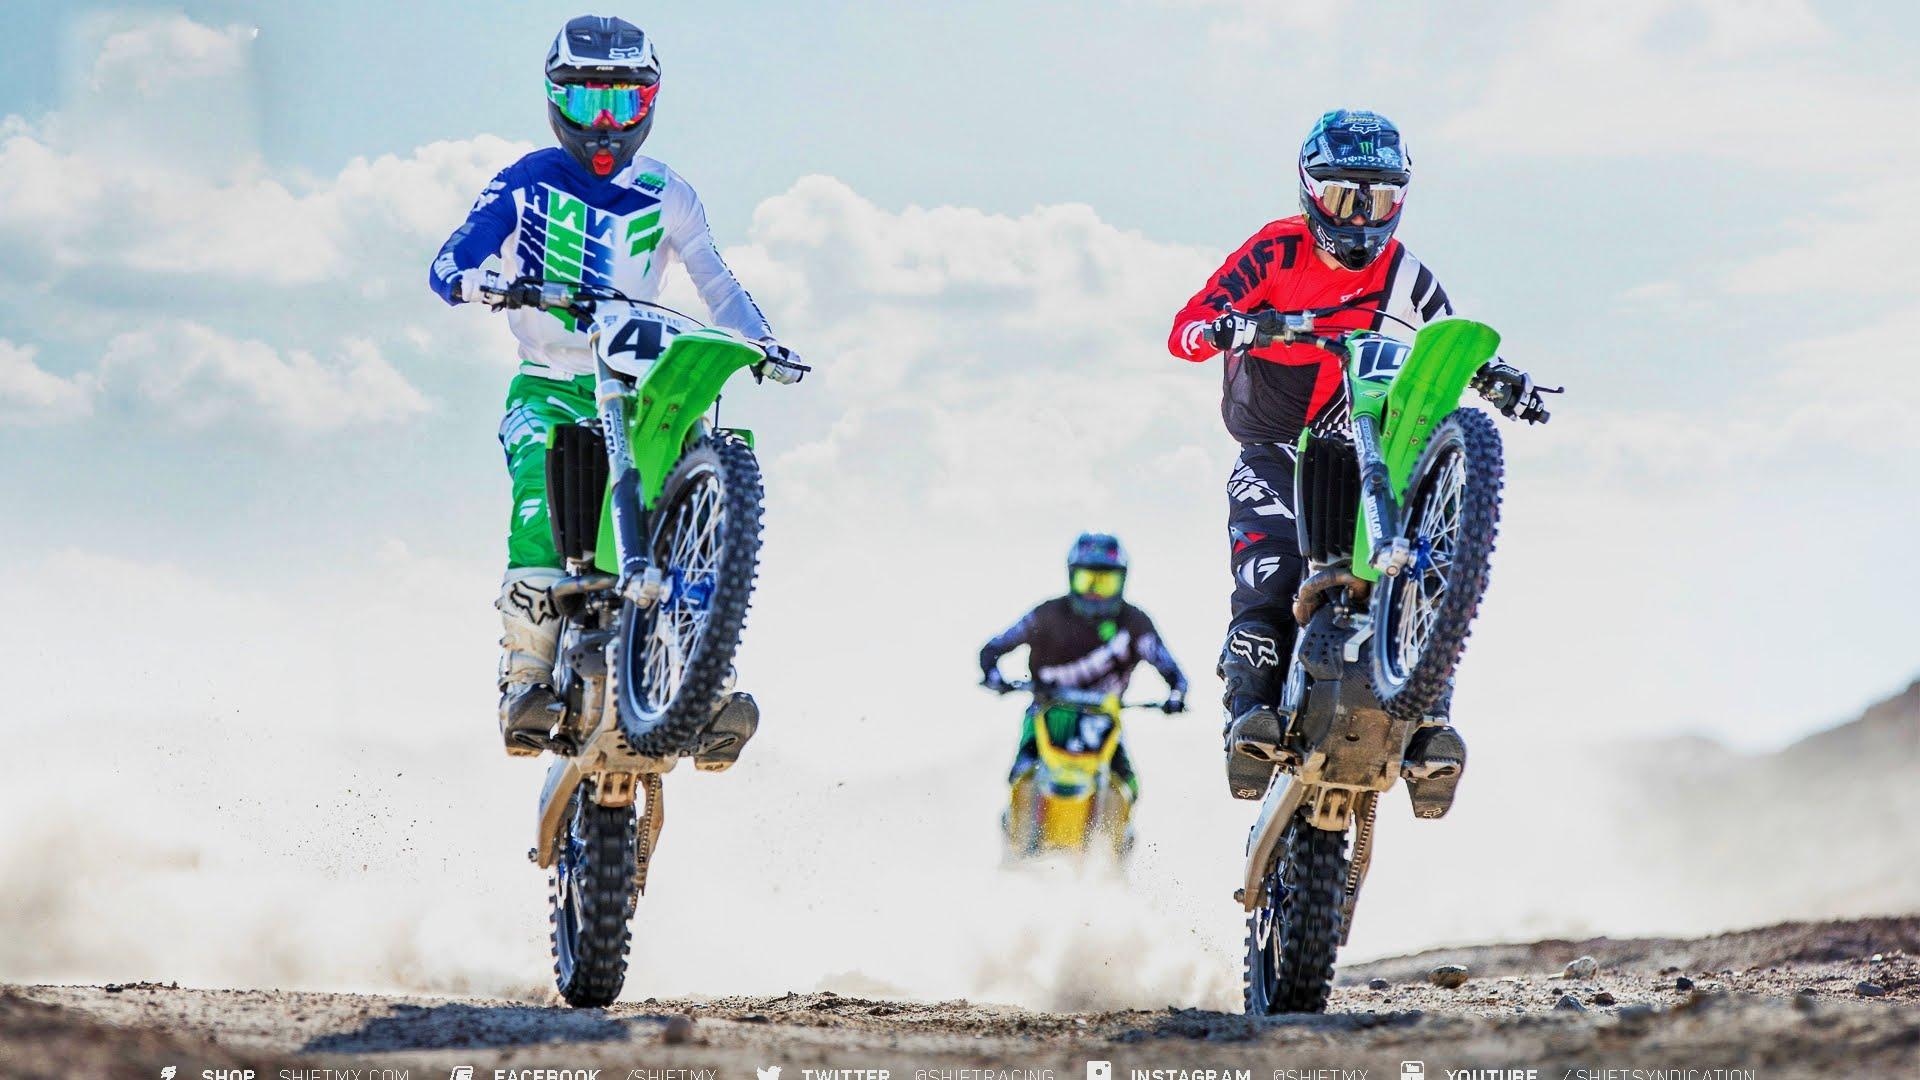 Motor Crossing | Killer Biker Gear & Accessories Motorcrossing